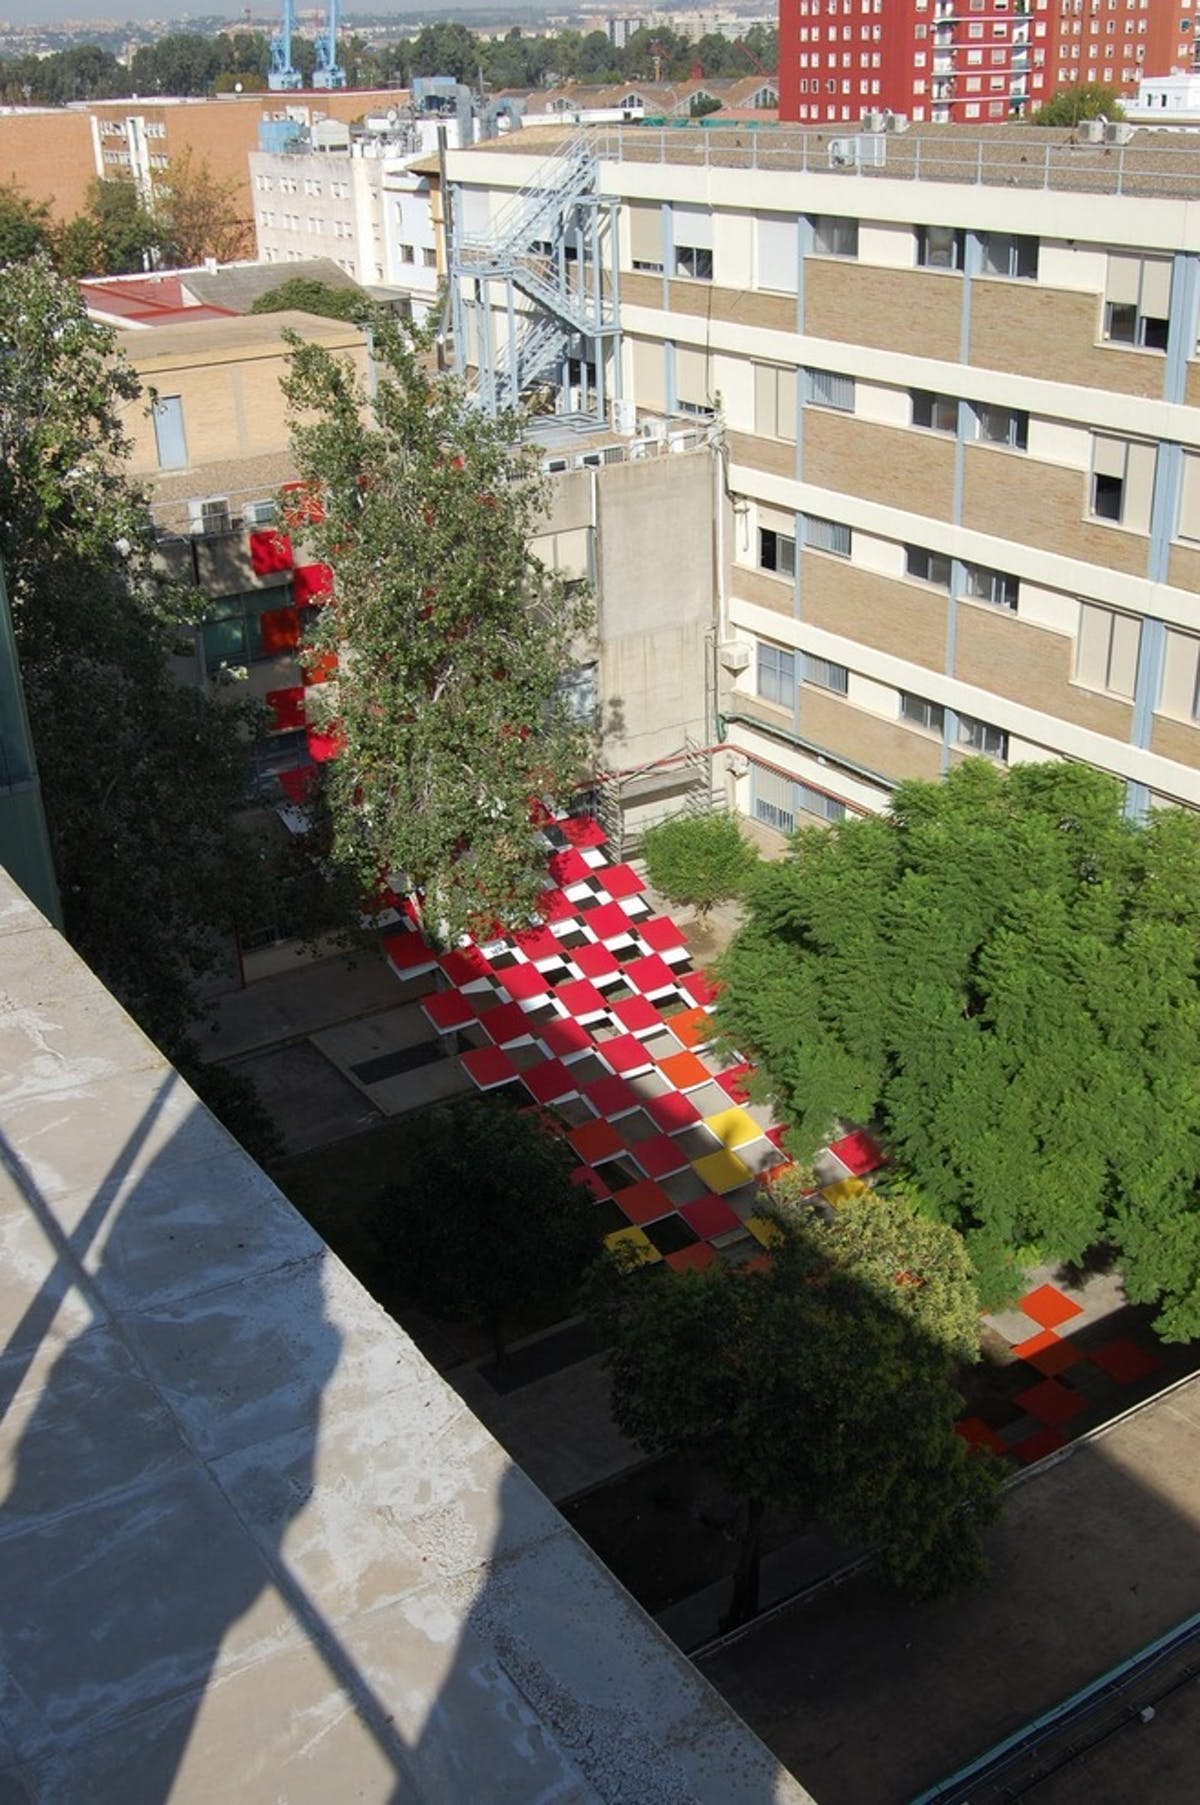 Ie 50 instalaci n exposici n con motivo del 50 - Ets arquitectura madrid ...